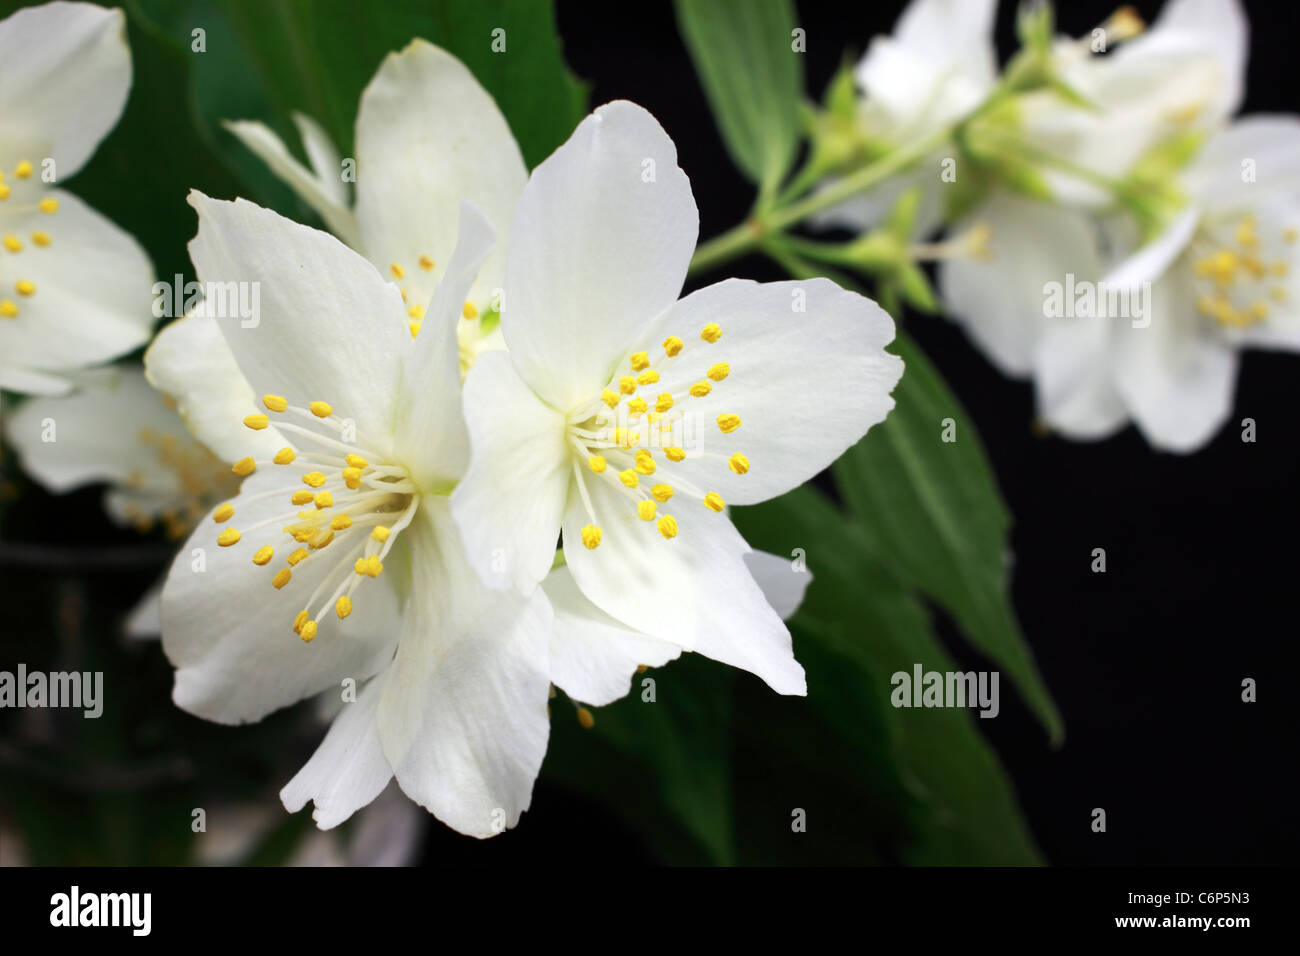 Jasmine flower stock photos jasmine flower stock images alamy white jasmine flowers close up stock image izmirmasajfo